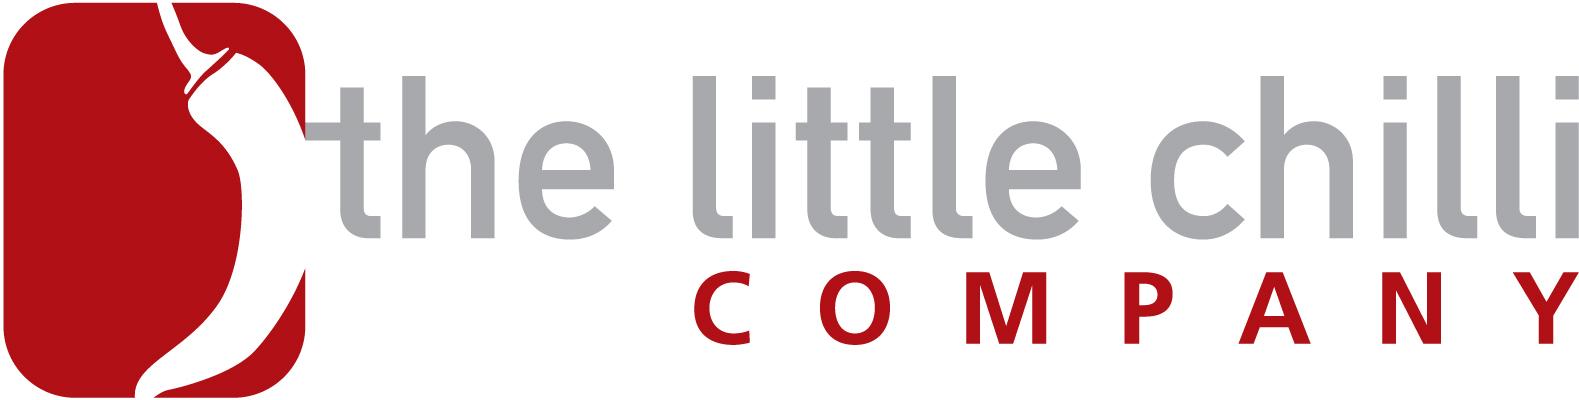 The Little Chilli Company logo.jpg